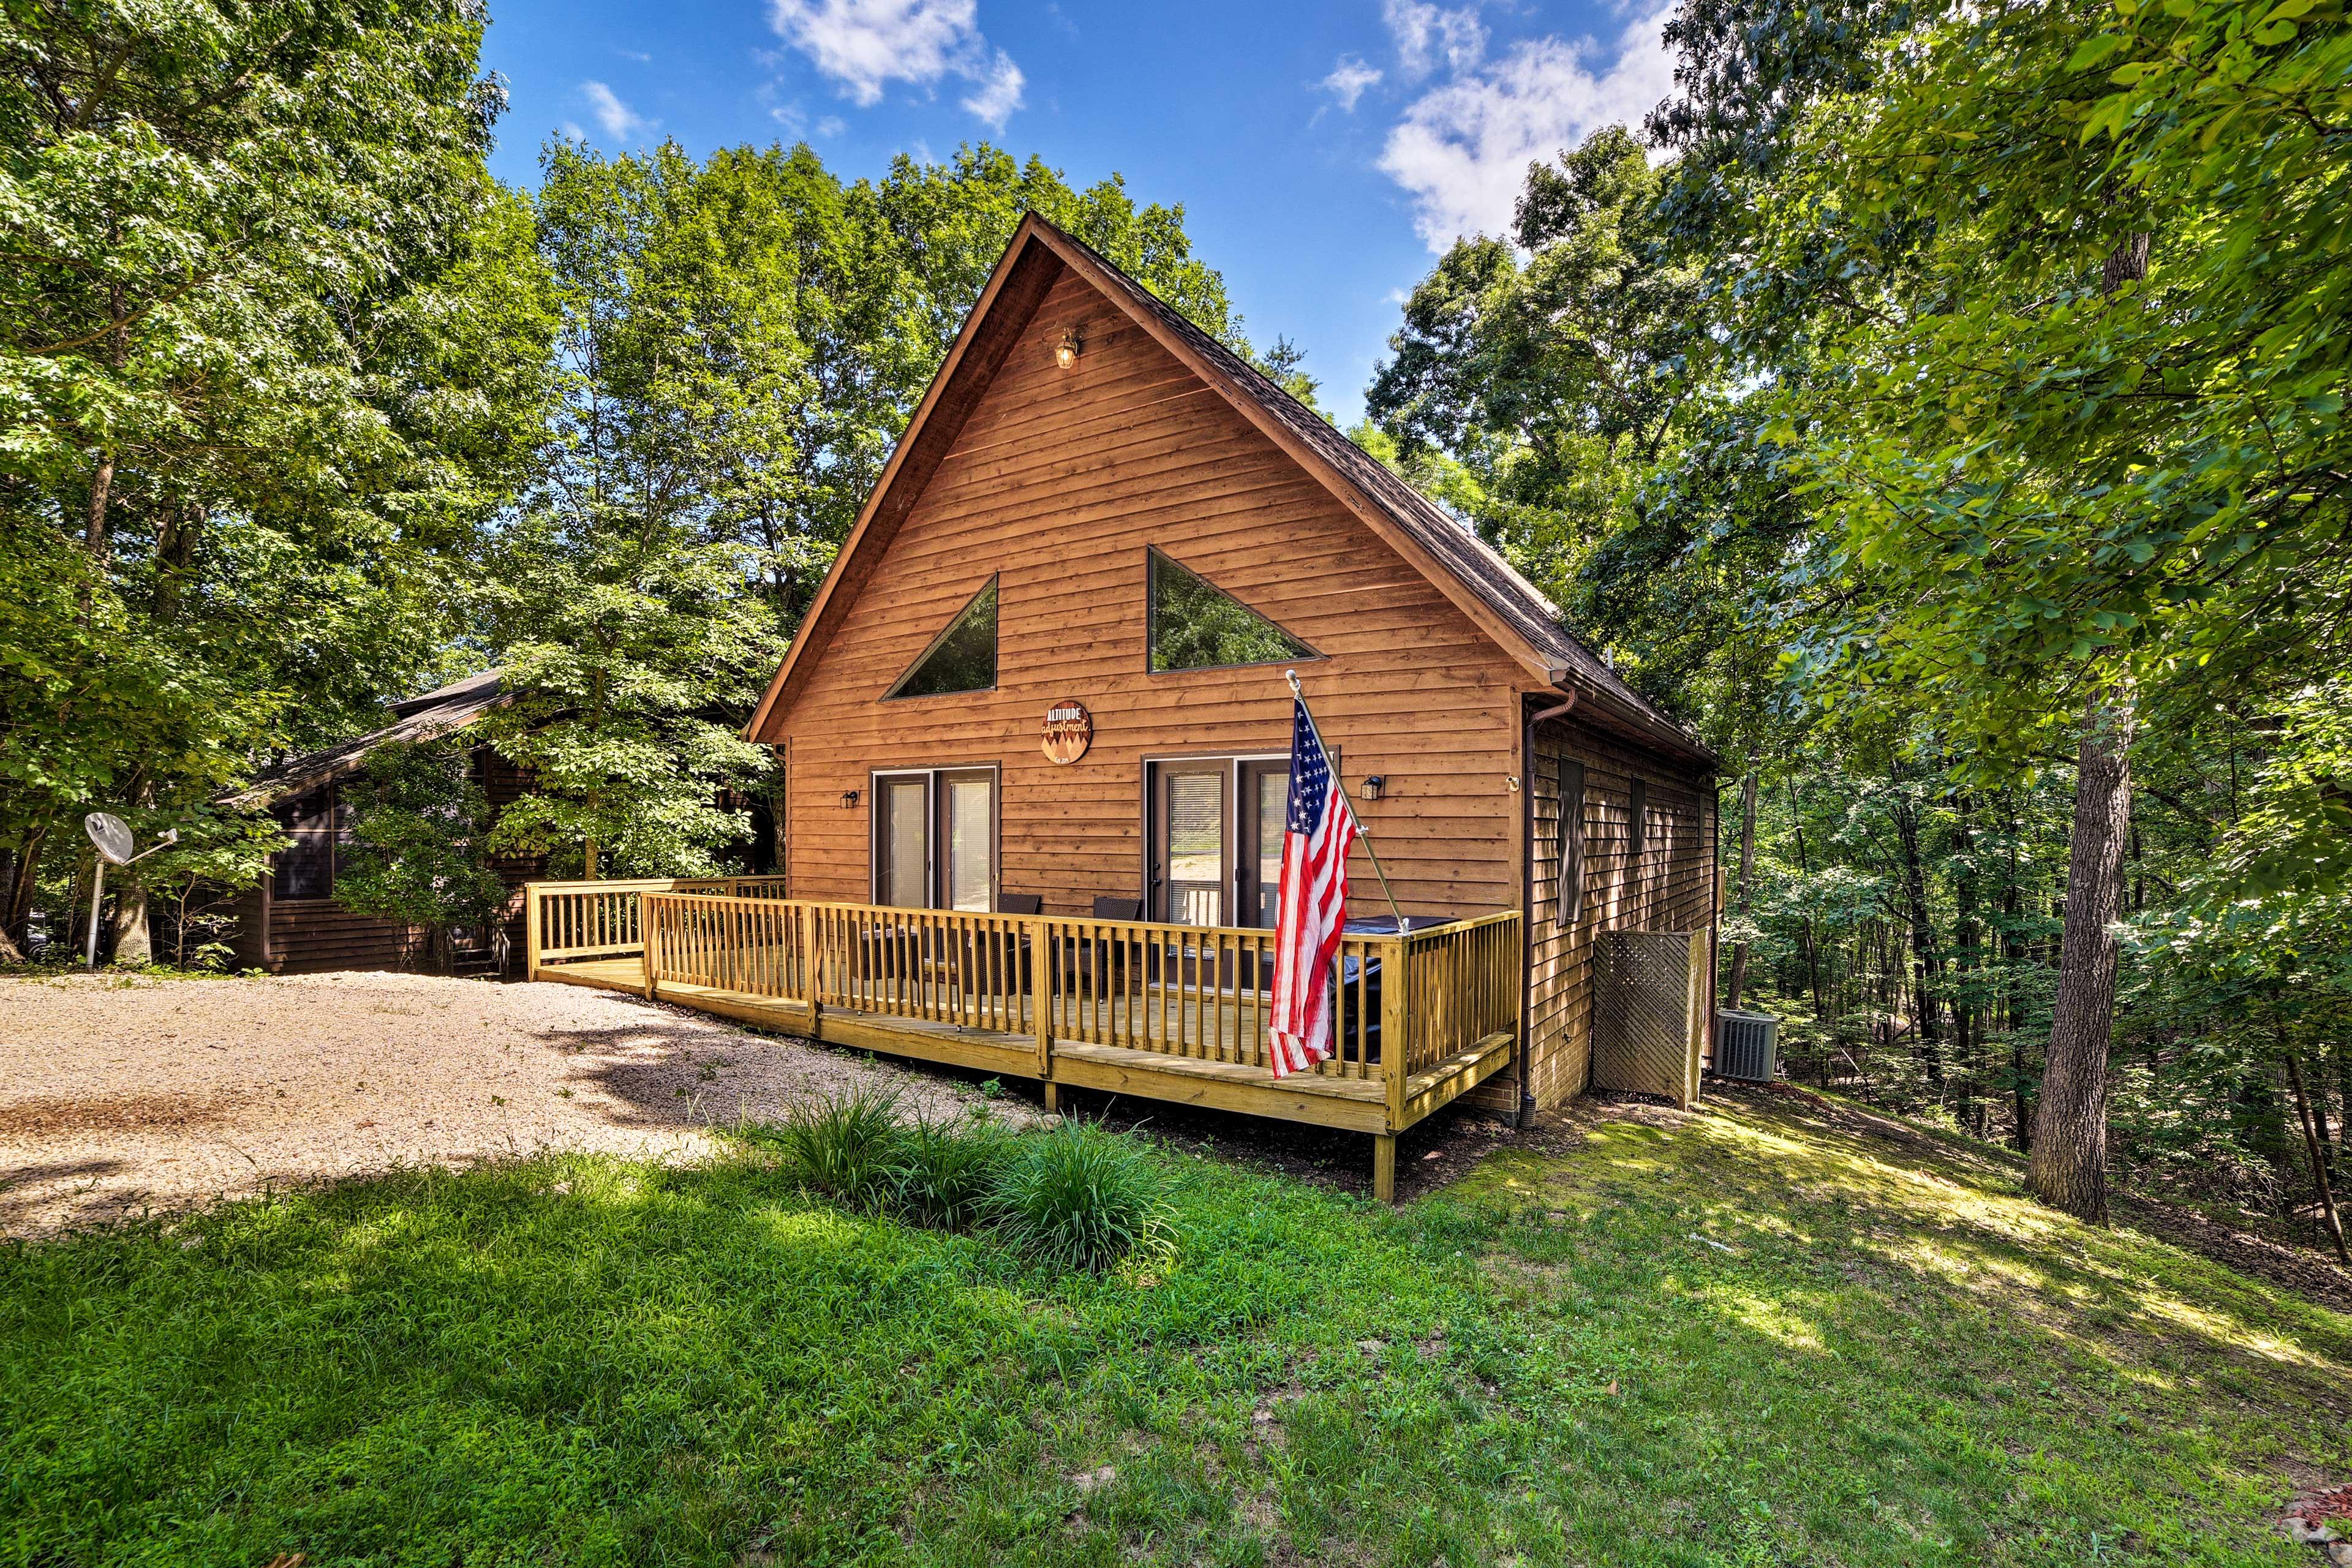 Skiing, mountain biking, hiking, & more outdoor activities surround the home.